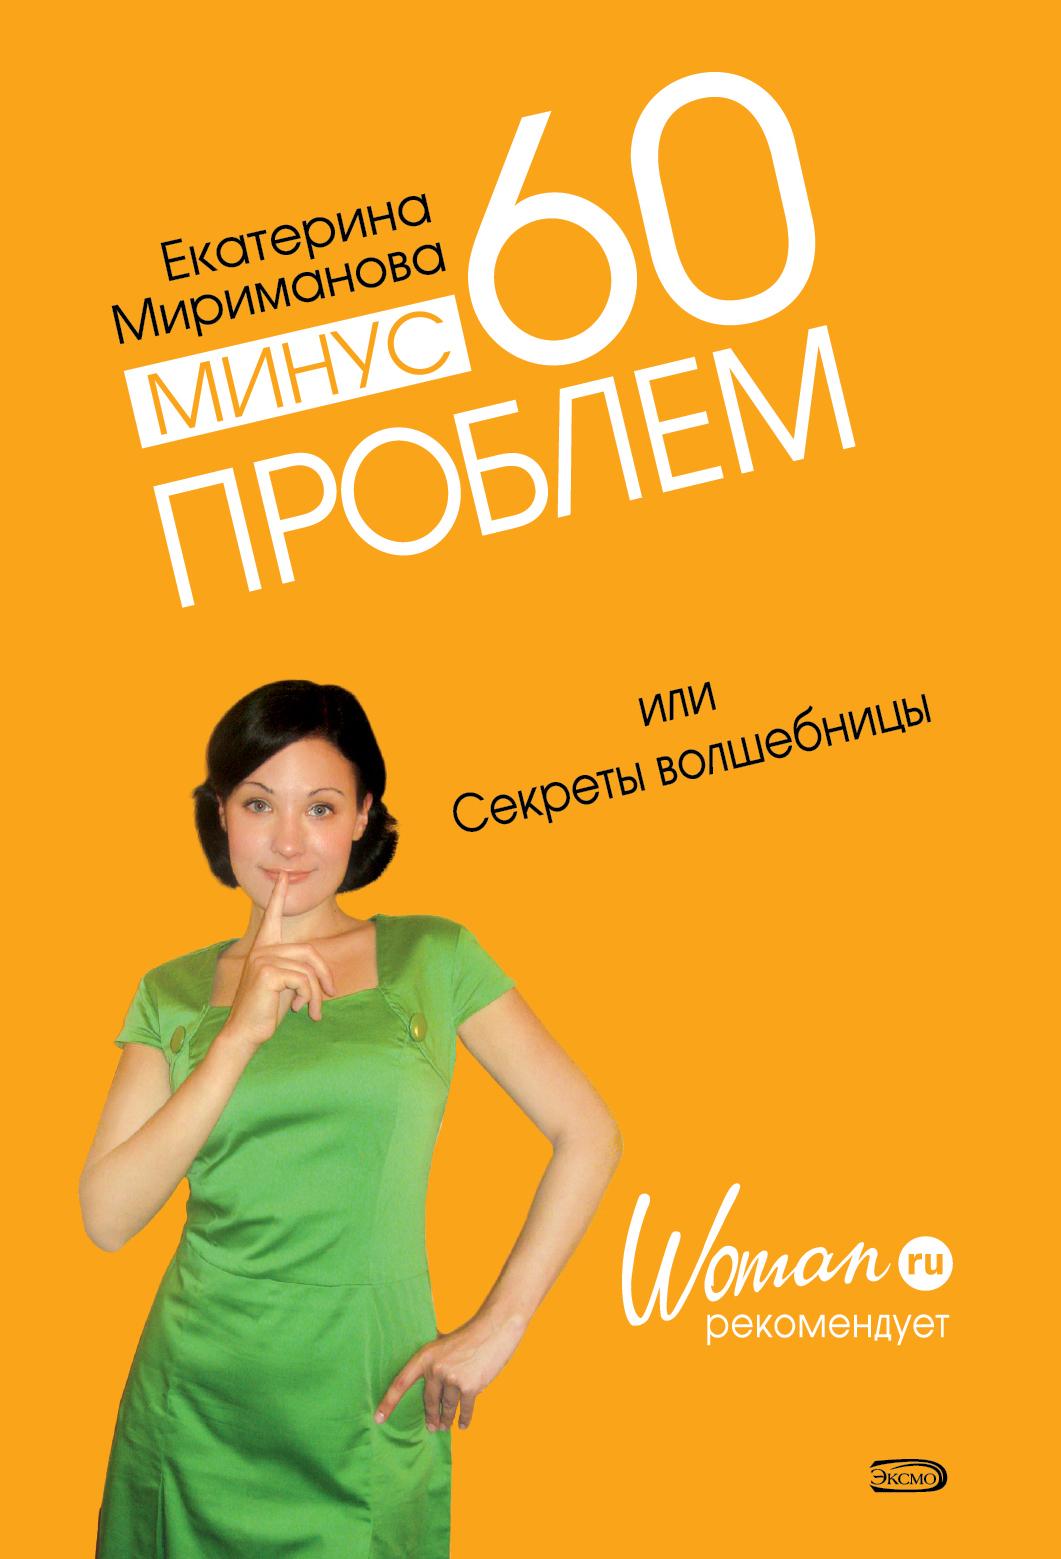 Мириманова Е.В. Минус 60 проблем, или Секреты волшебницы